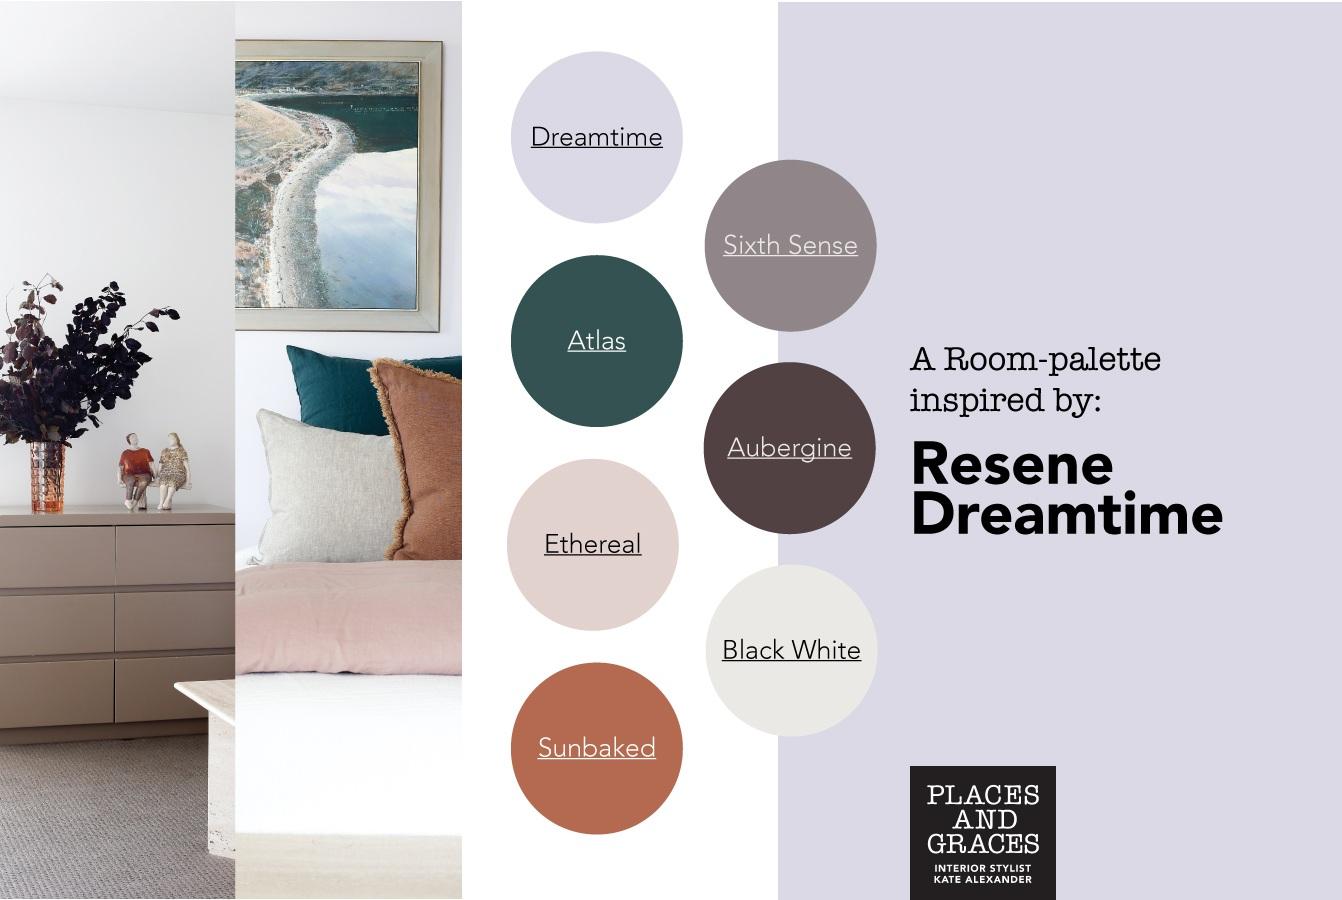 Places%26Graces-Resene-Dreamtime-Moodboard-Teaser-01.jpg